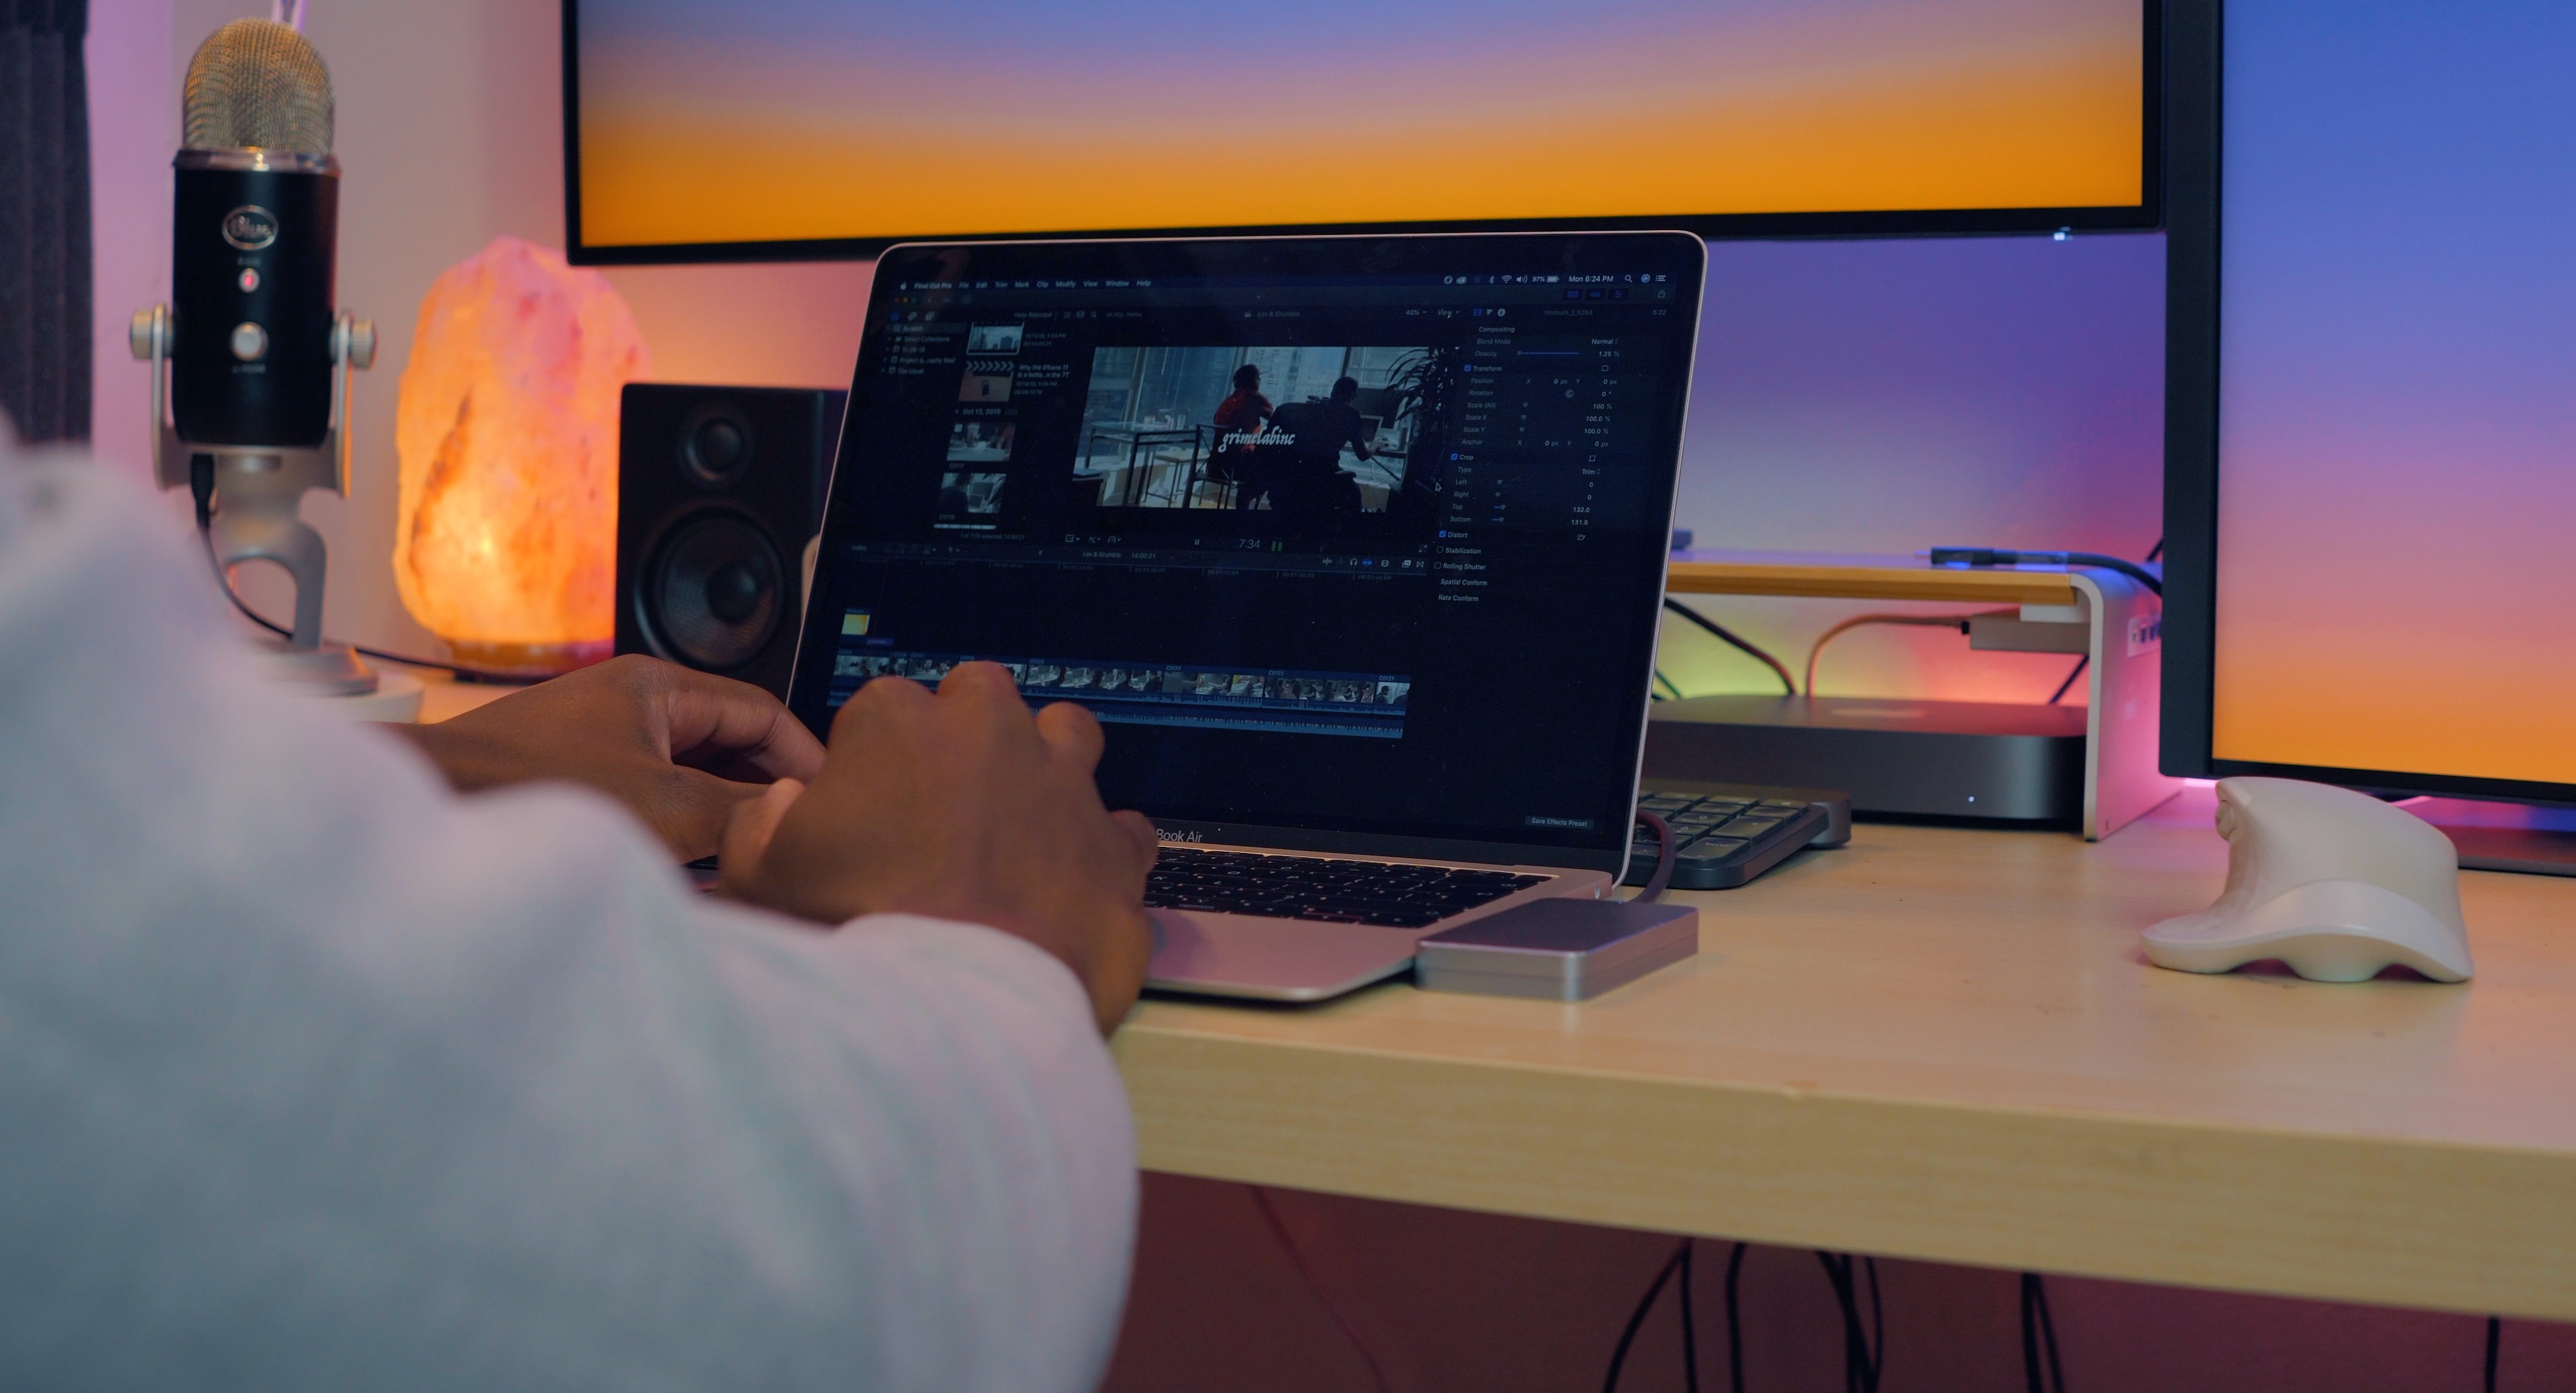 MacBook Air on a desktop